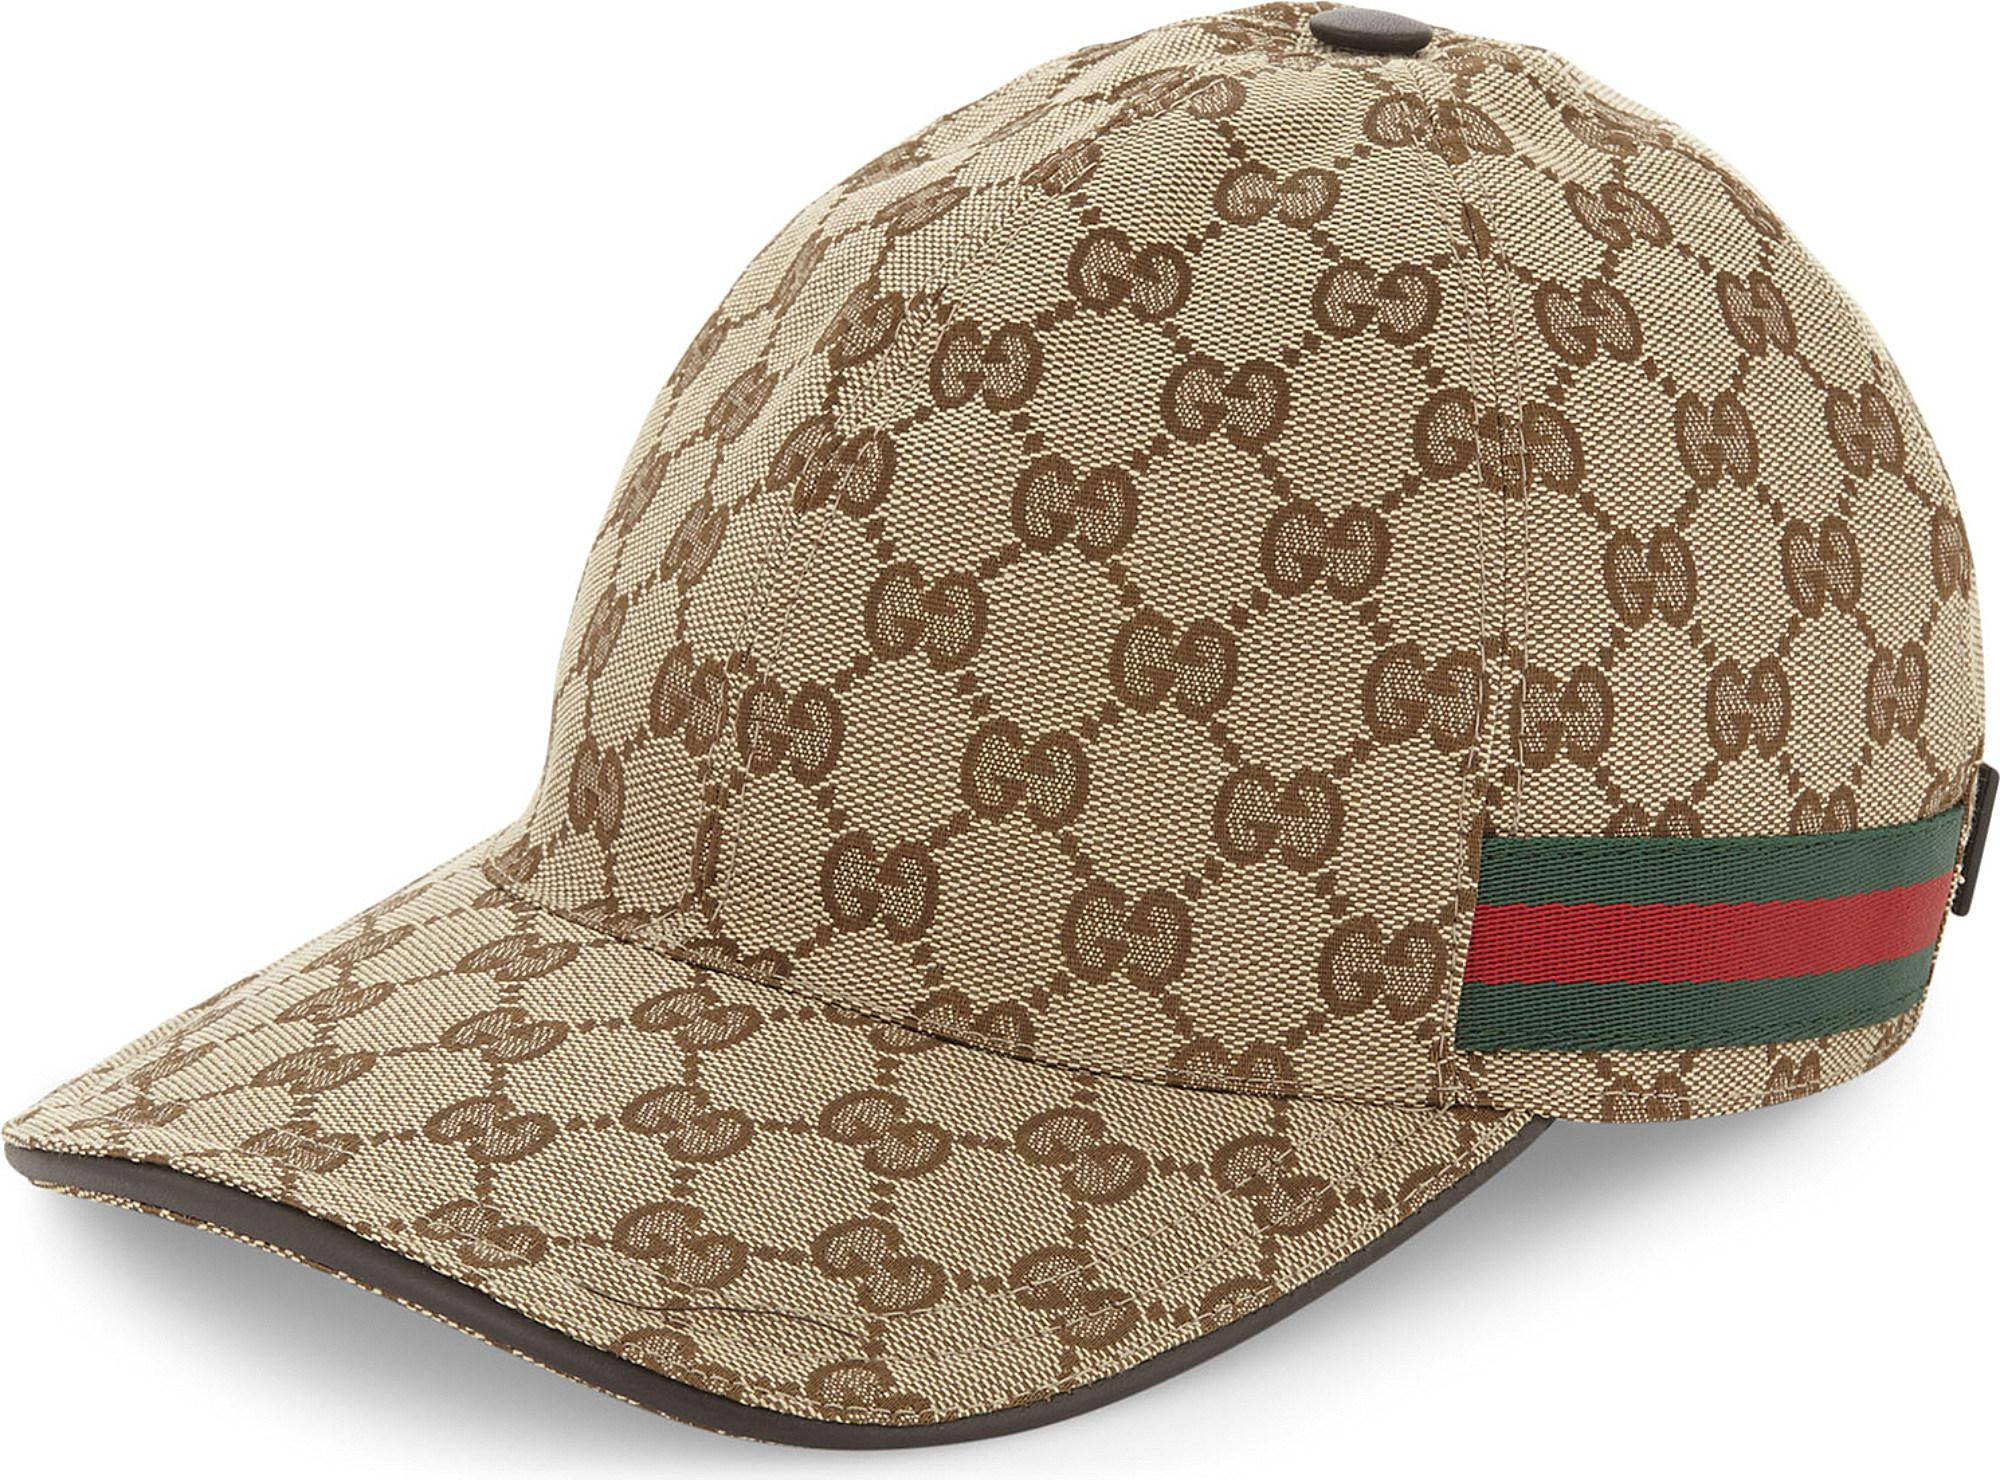 f50a95c2fb0 Gucci GG Web Stripe Baseball Cap in Brown for Men - Save 51% - Lyst